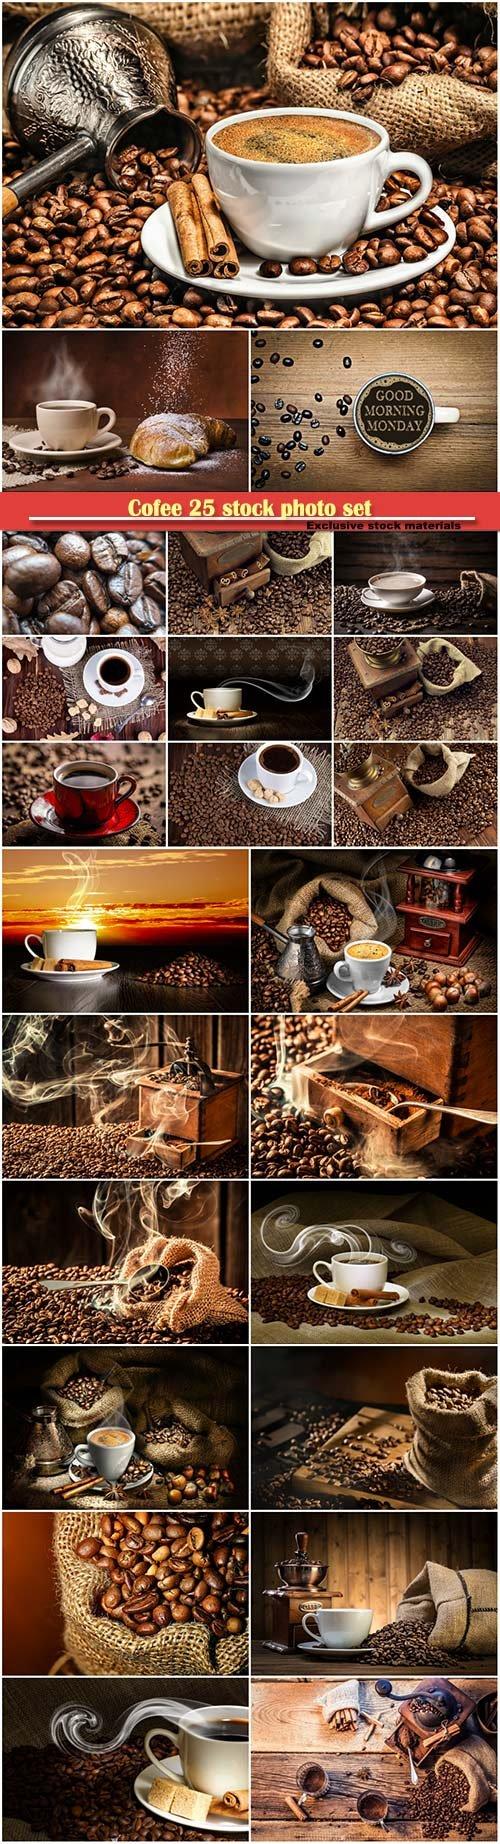 Cofee 25 stock photo set